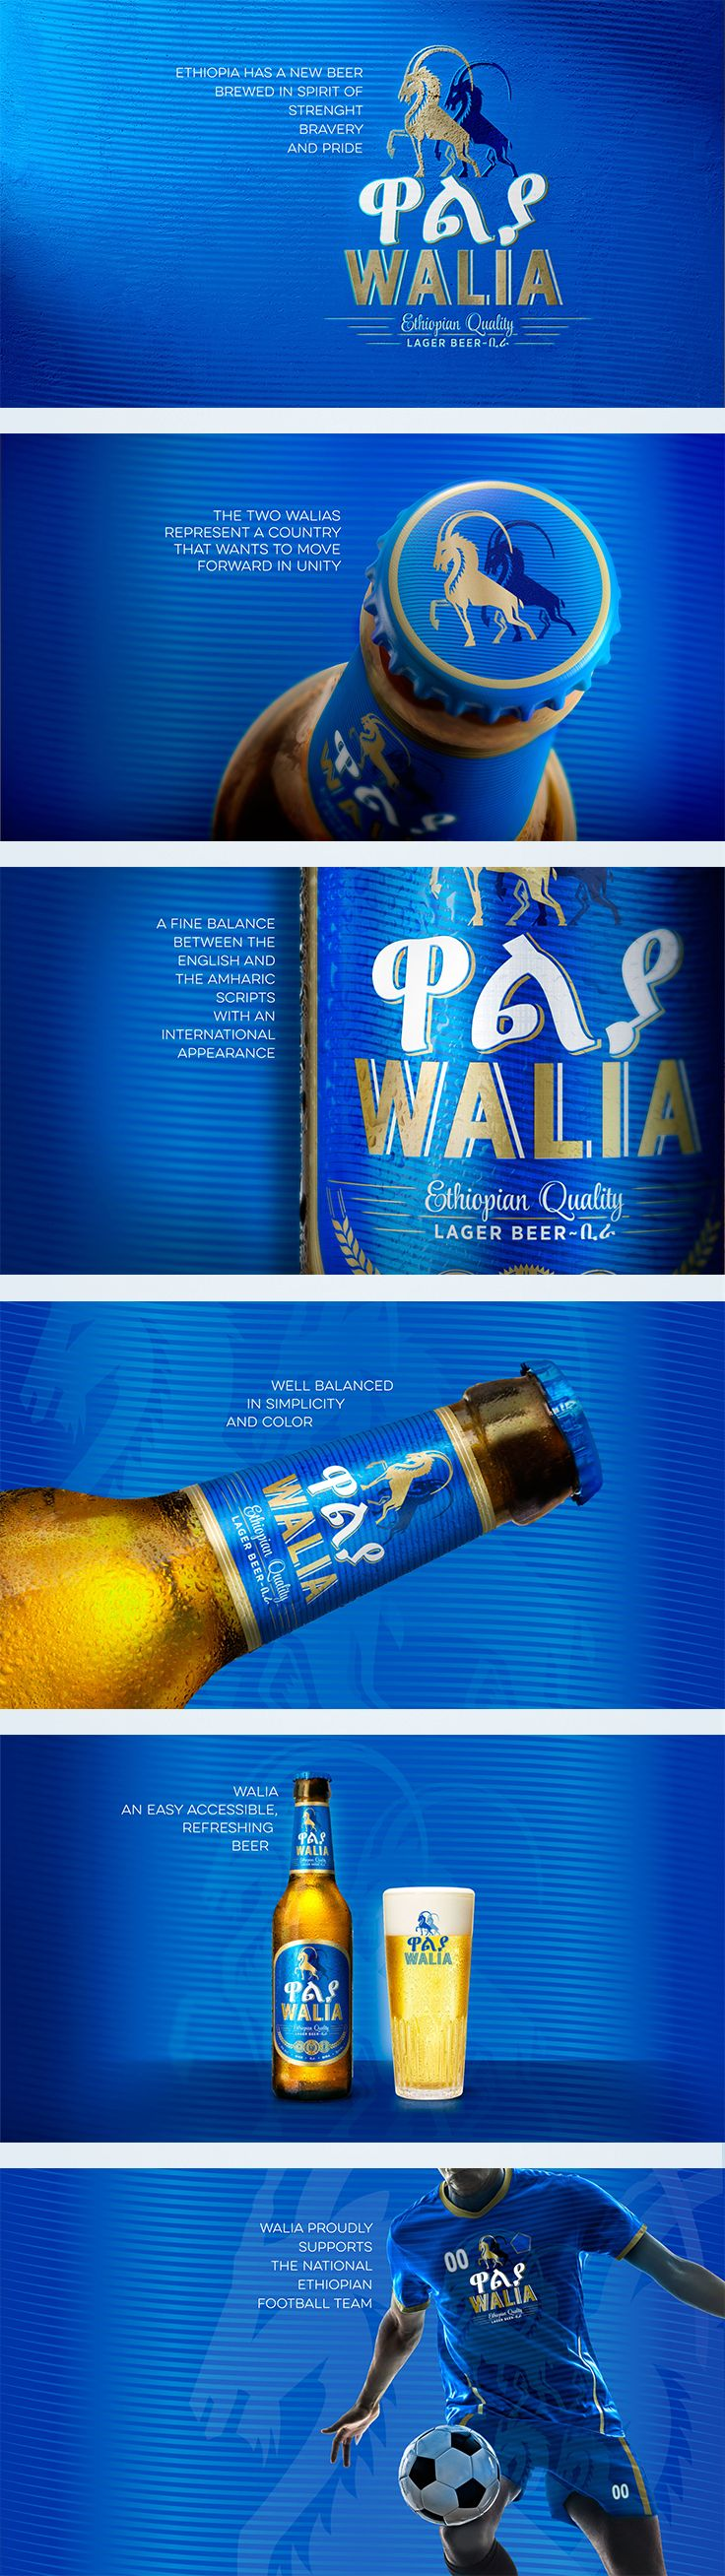 Walia beer, the new Ethiopian beer brand!